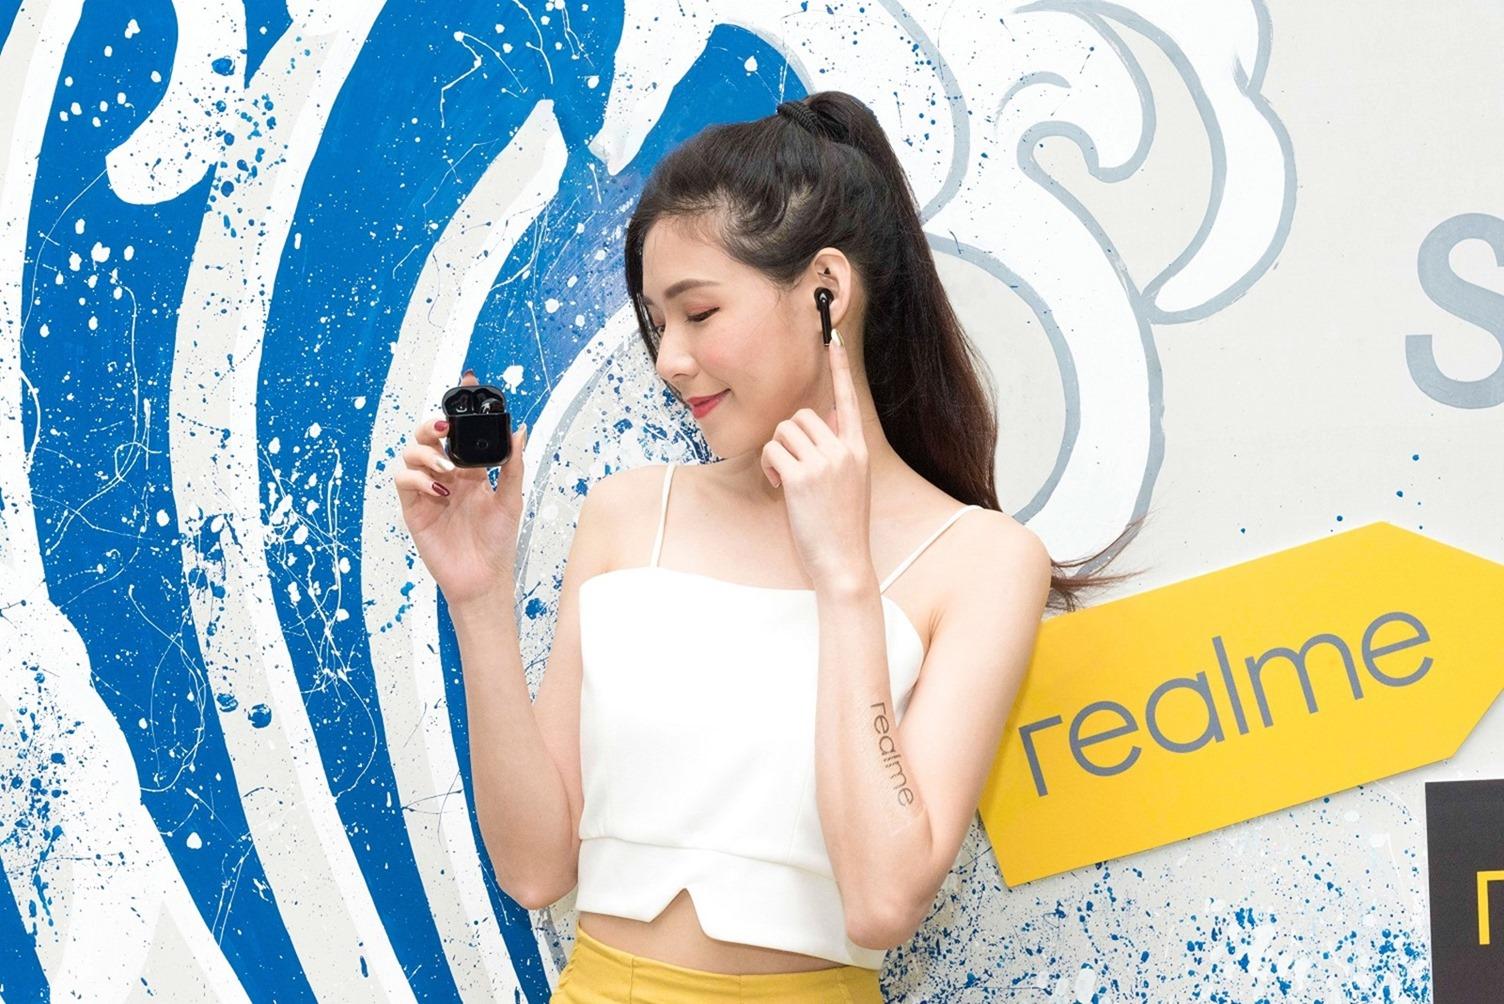 realme Buds Air 3 月中開賣,實銷僅半個月即躍升當月耳機市場排名第六 黑潮新色 5 月 21 日正式開搶 現折 200 元超殺回饋 專屬保護套同步開賣 @3C 達人廖阿輝